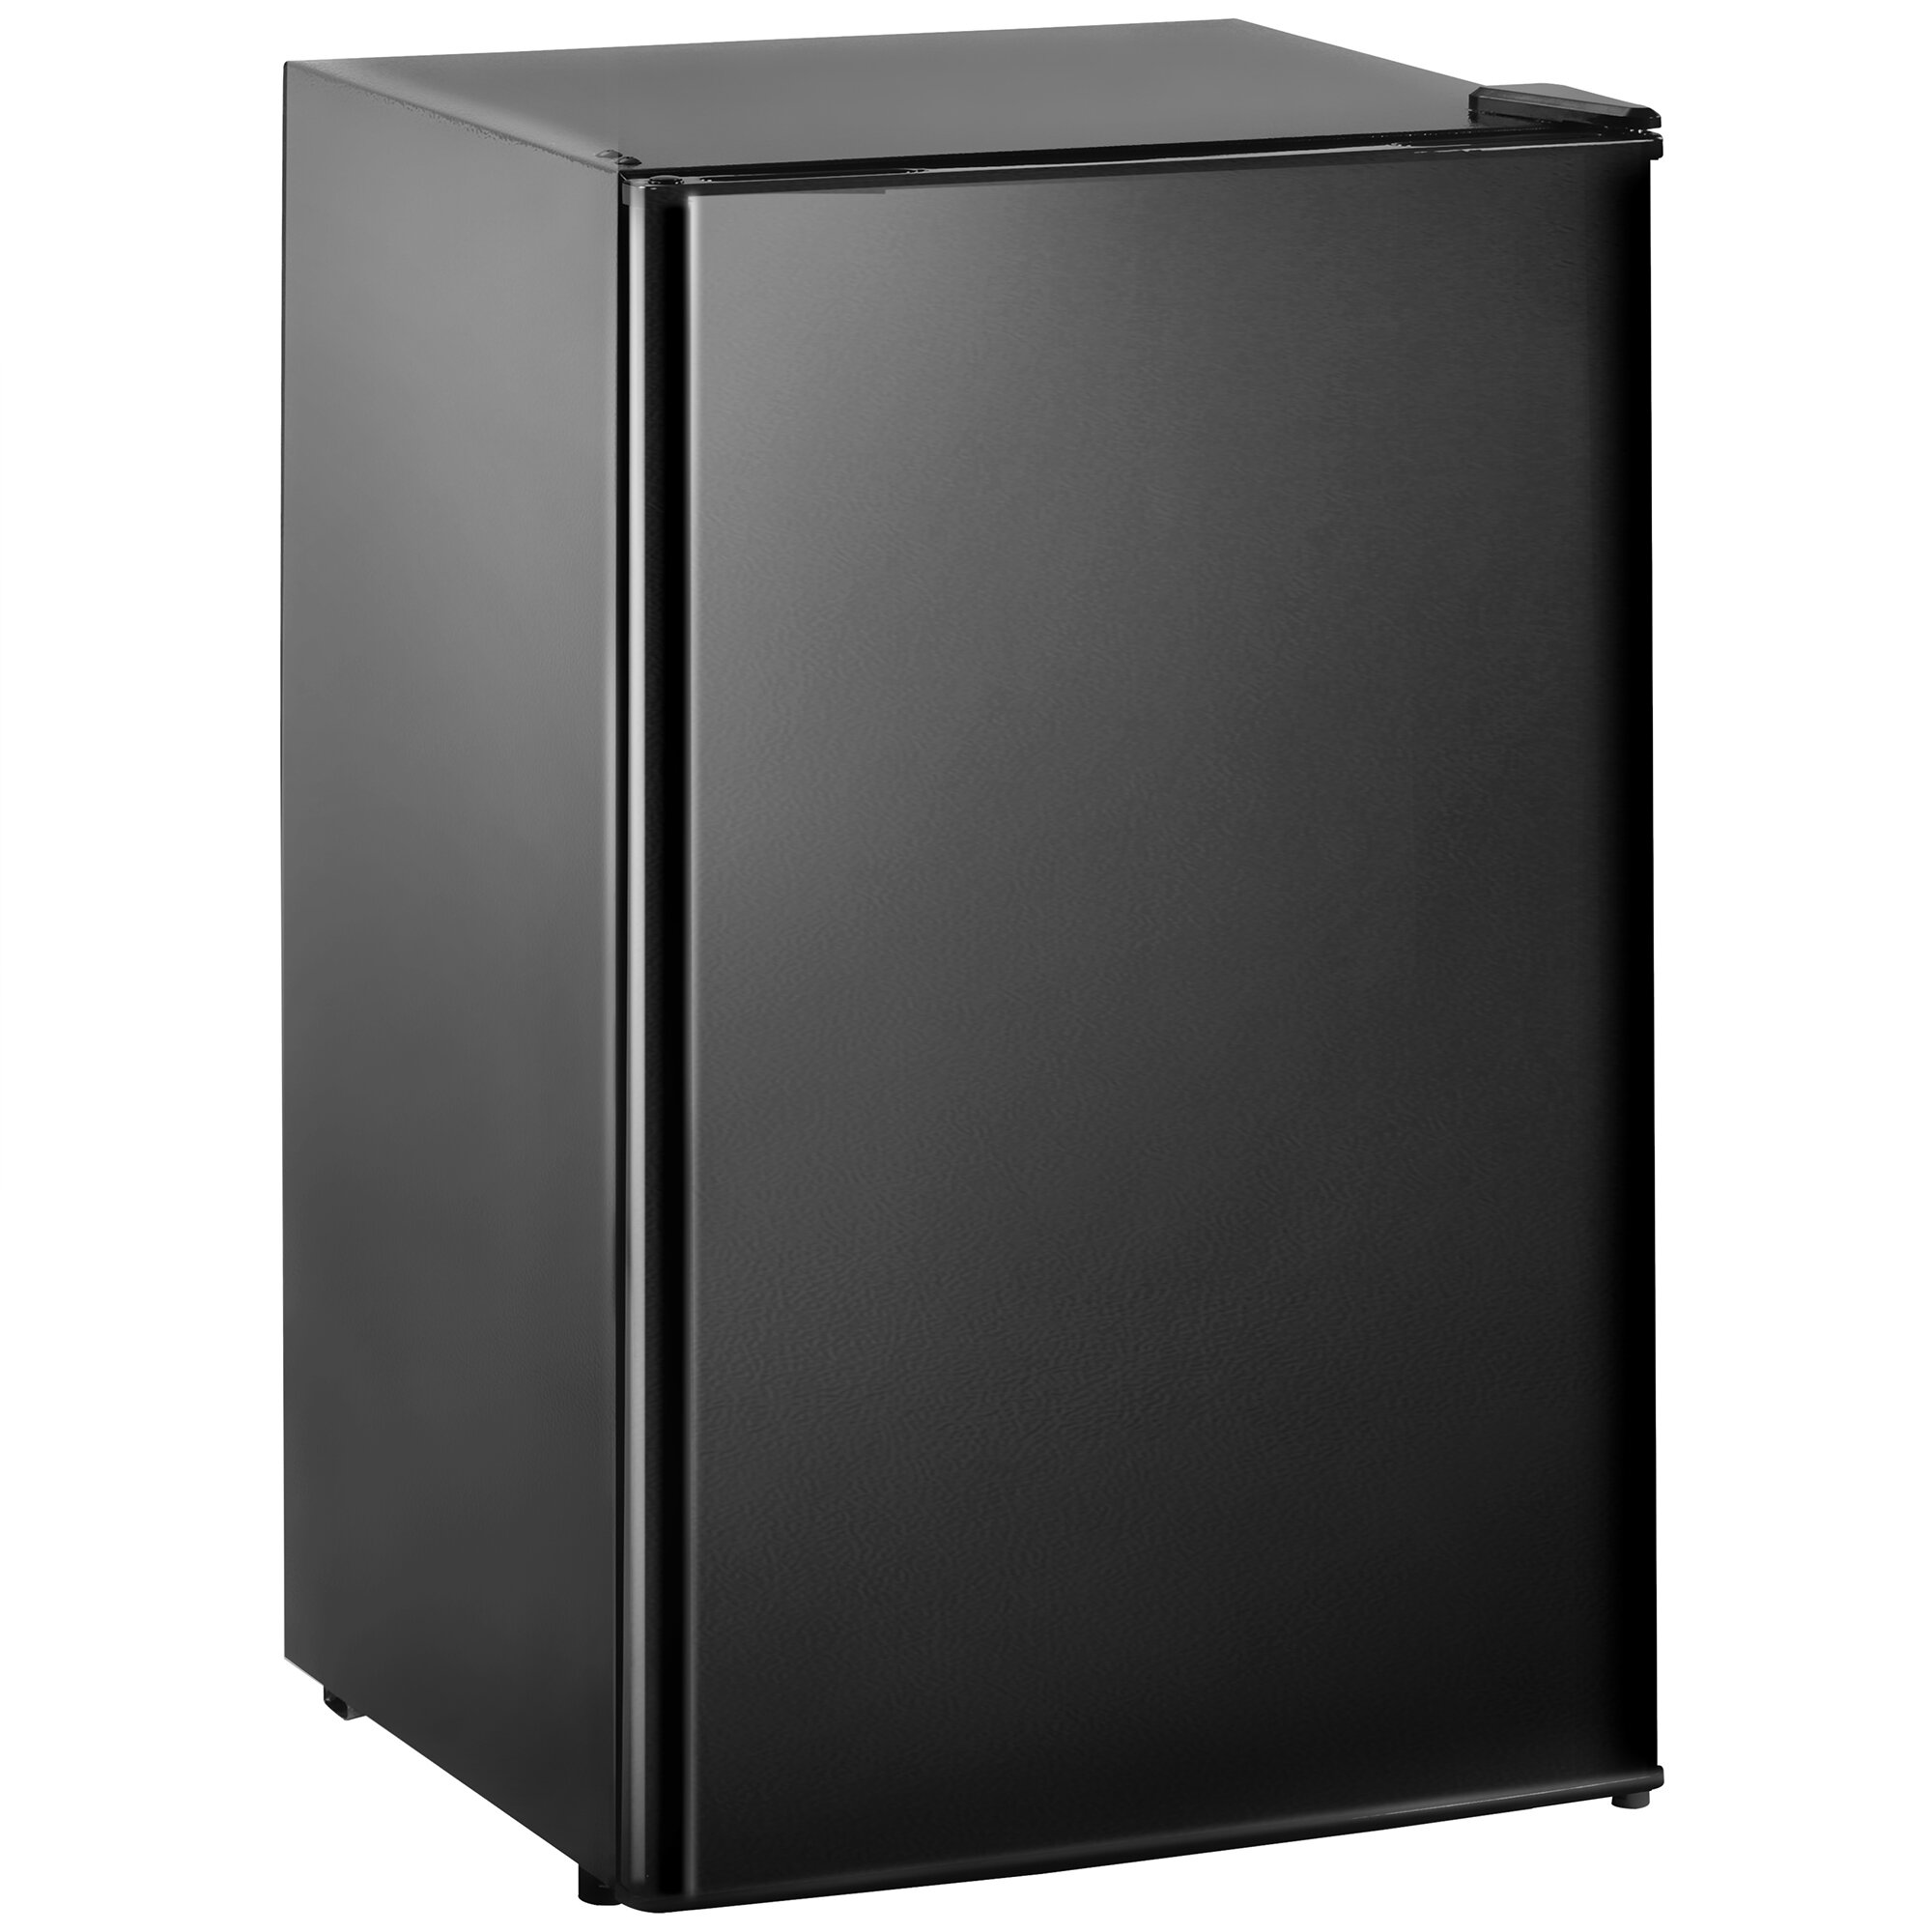 Souiwuzi Compact Refrigerator With Freezer Energy Star 3 2 Cu Ft Mini Fridge With Reversible Door 5 Settings Temperature Adjustable For Kitchen Bedroom Dorm Apartment Bar Office Rv Wayfair